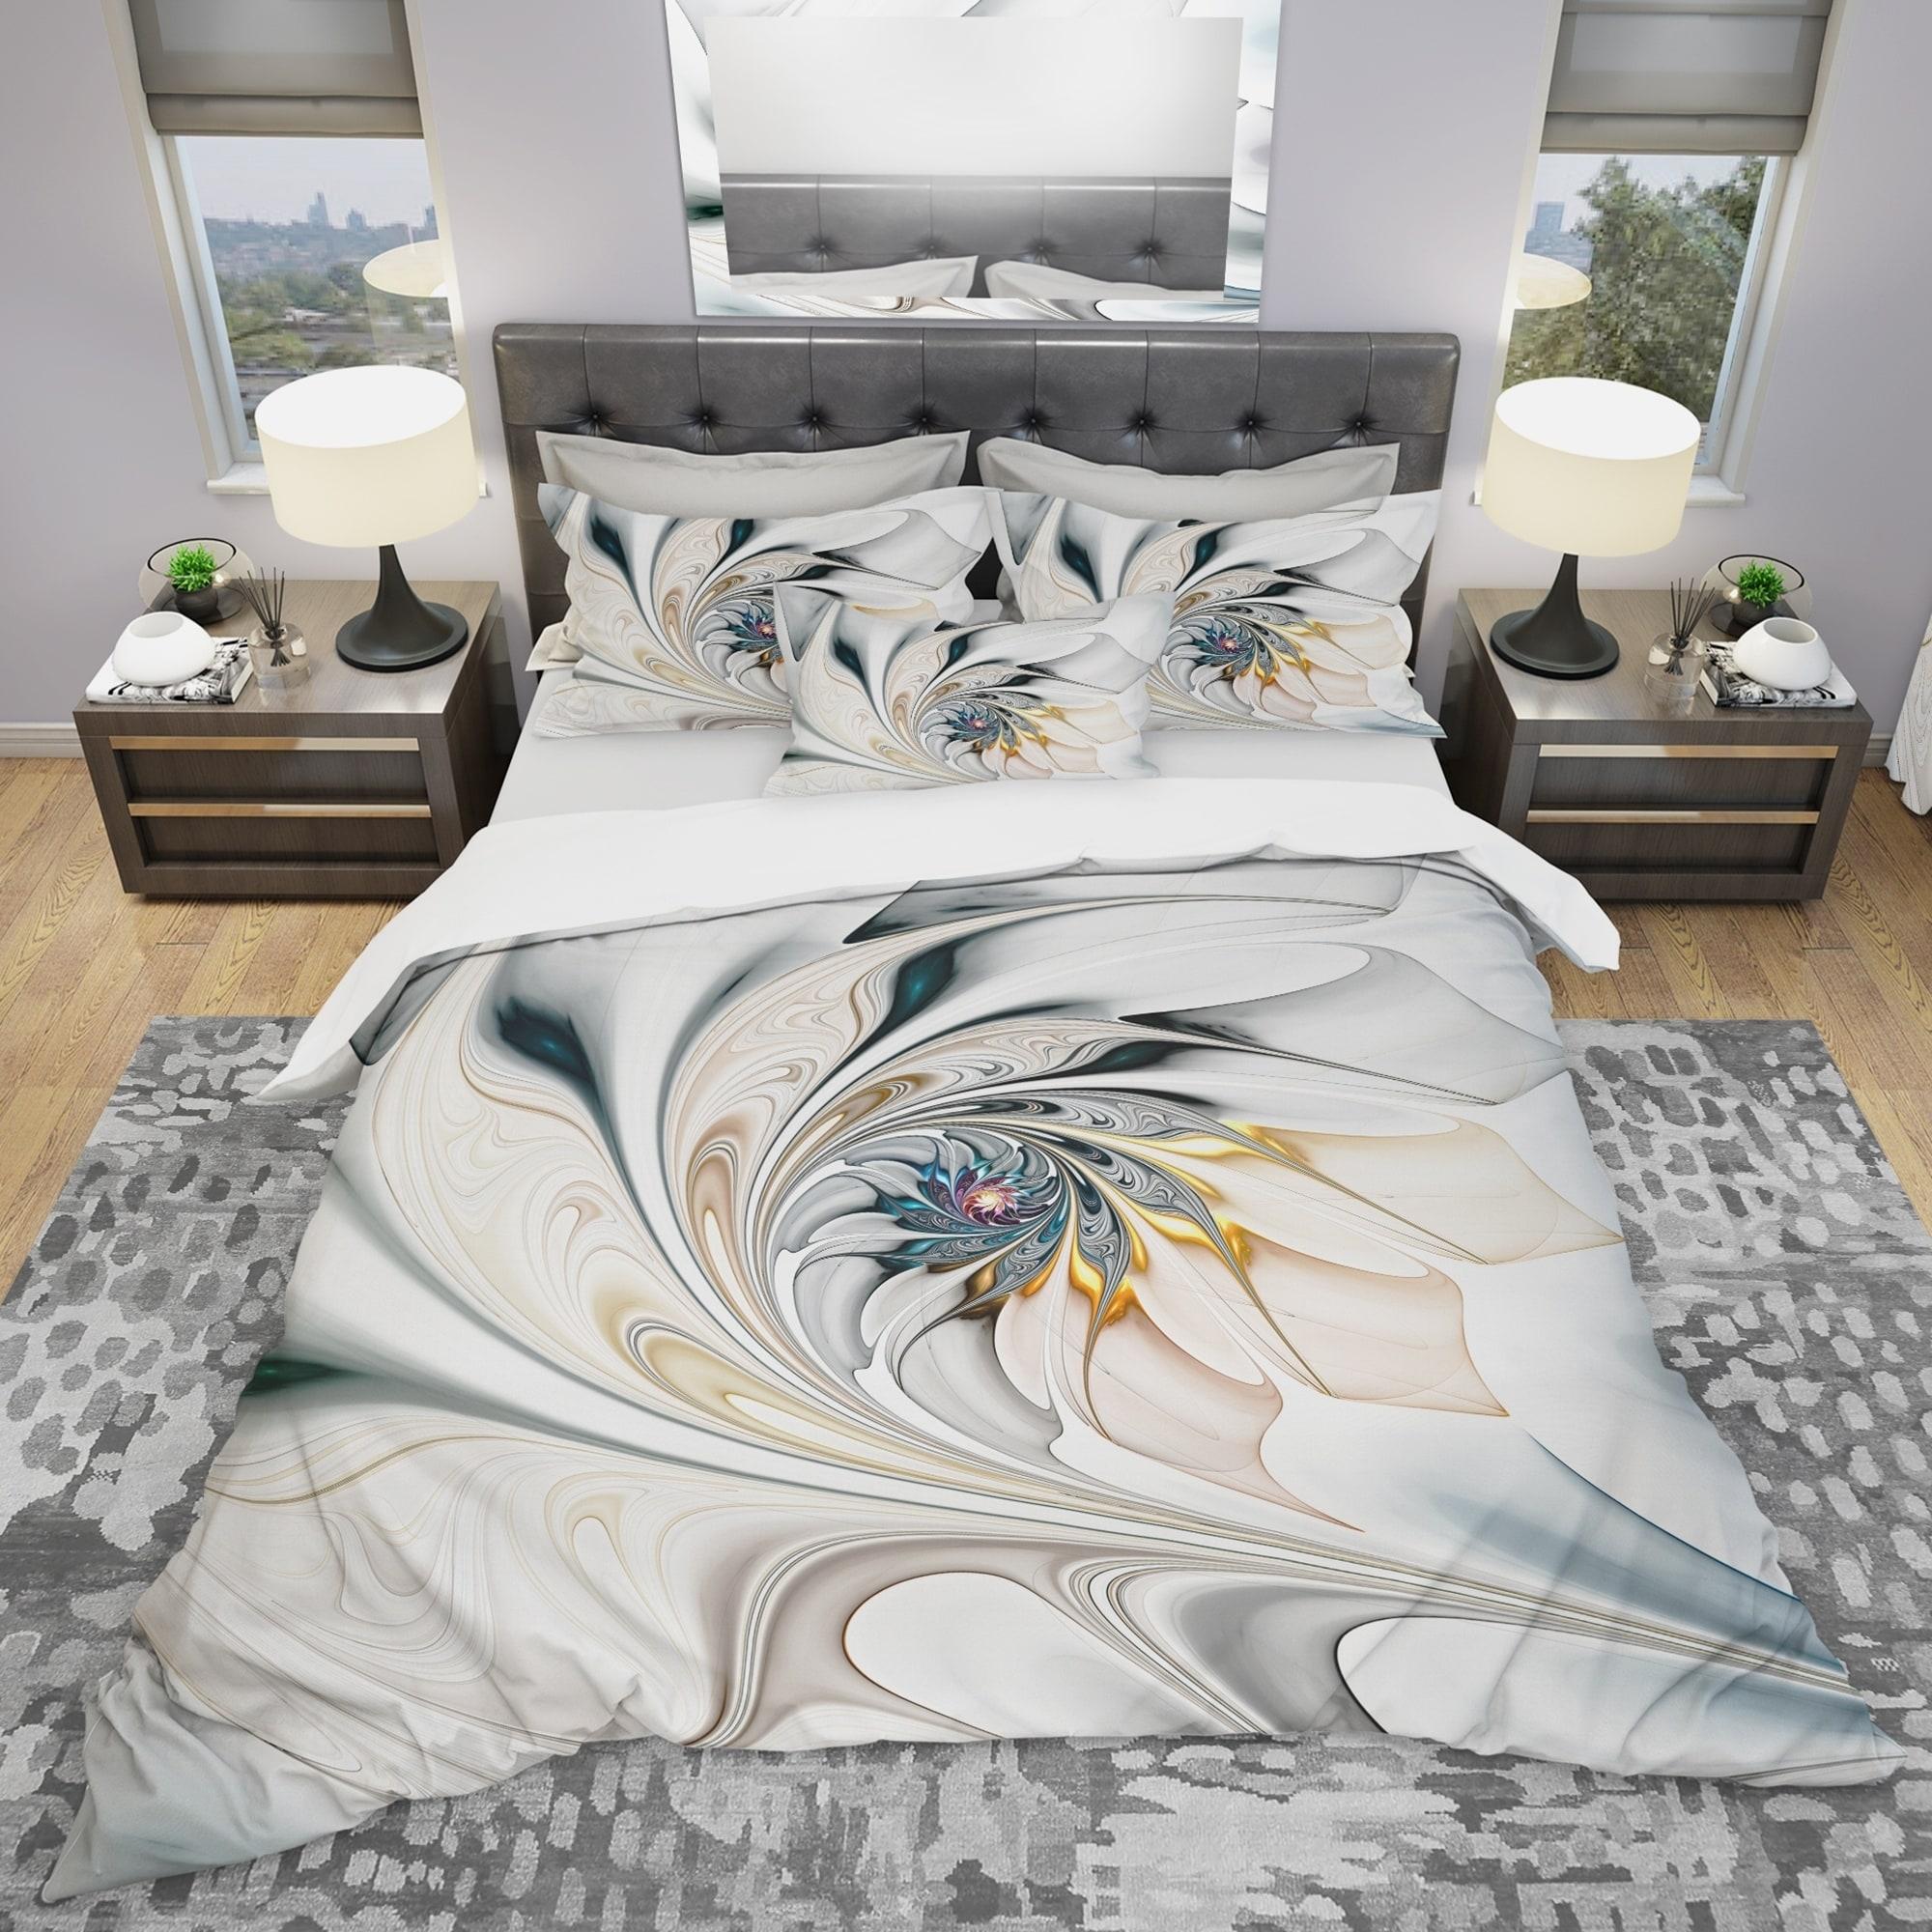 Designart White Stained Glass Floral Art Duvet Cover Set On Sale Overstock 23507381